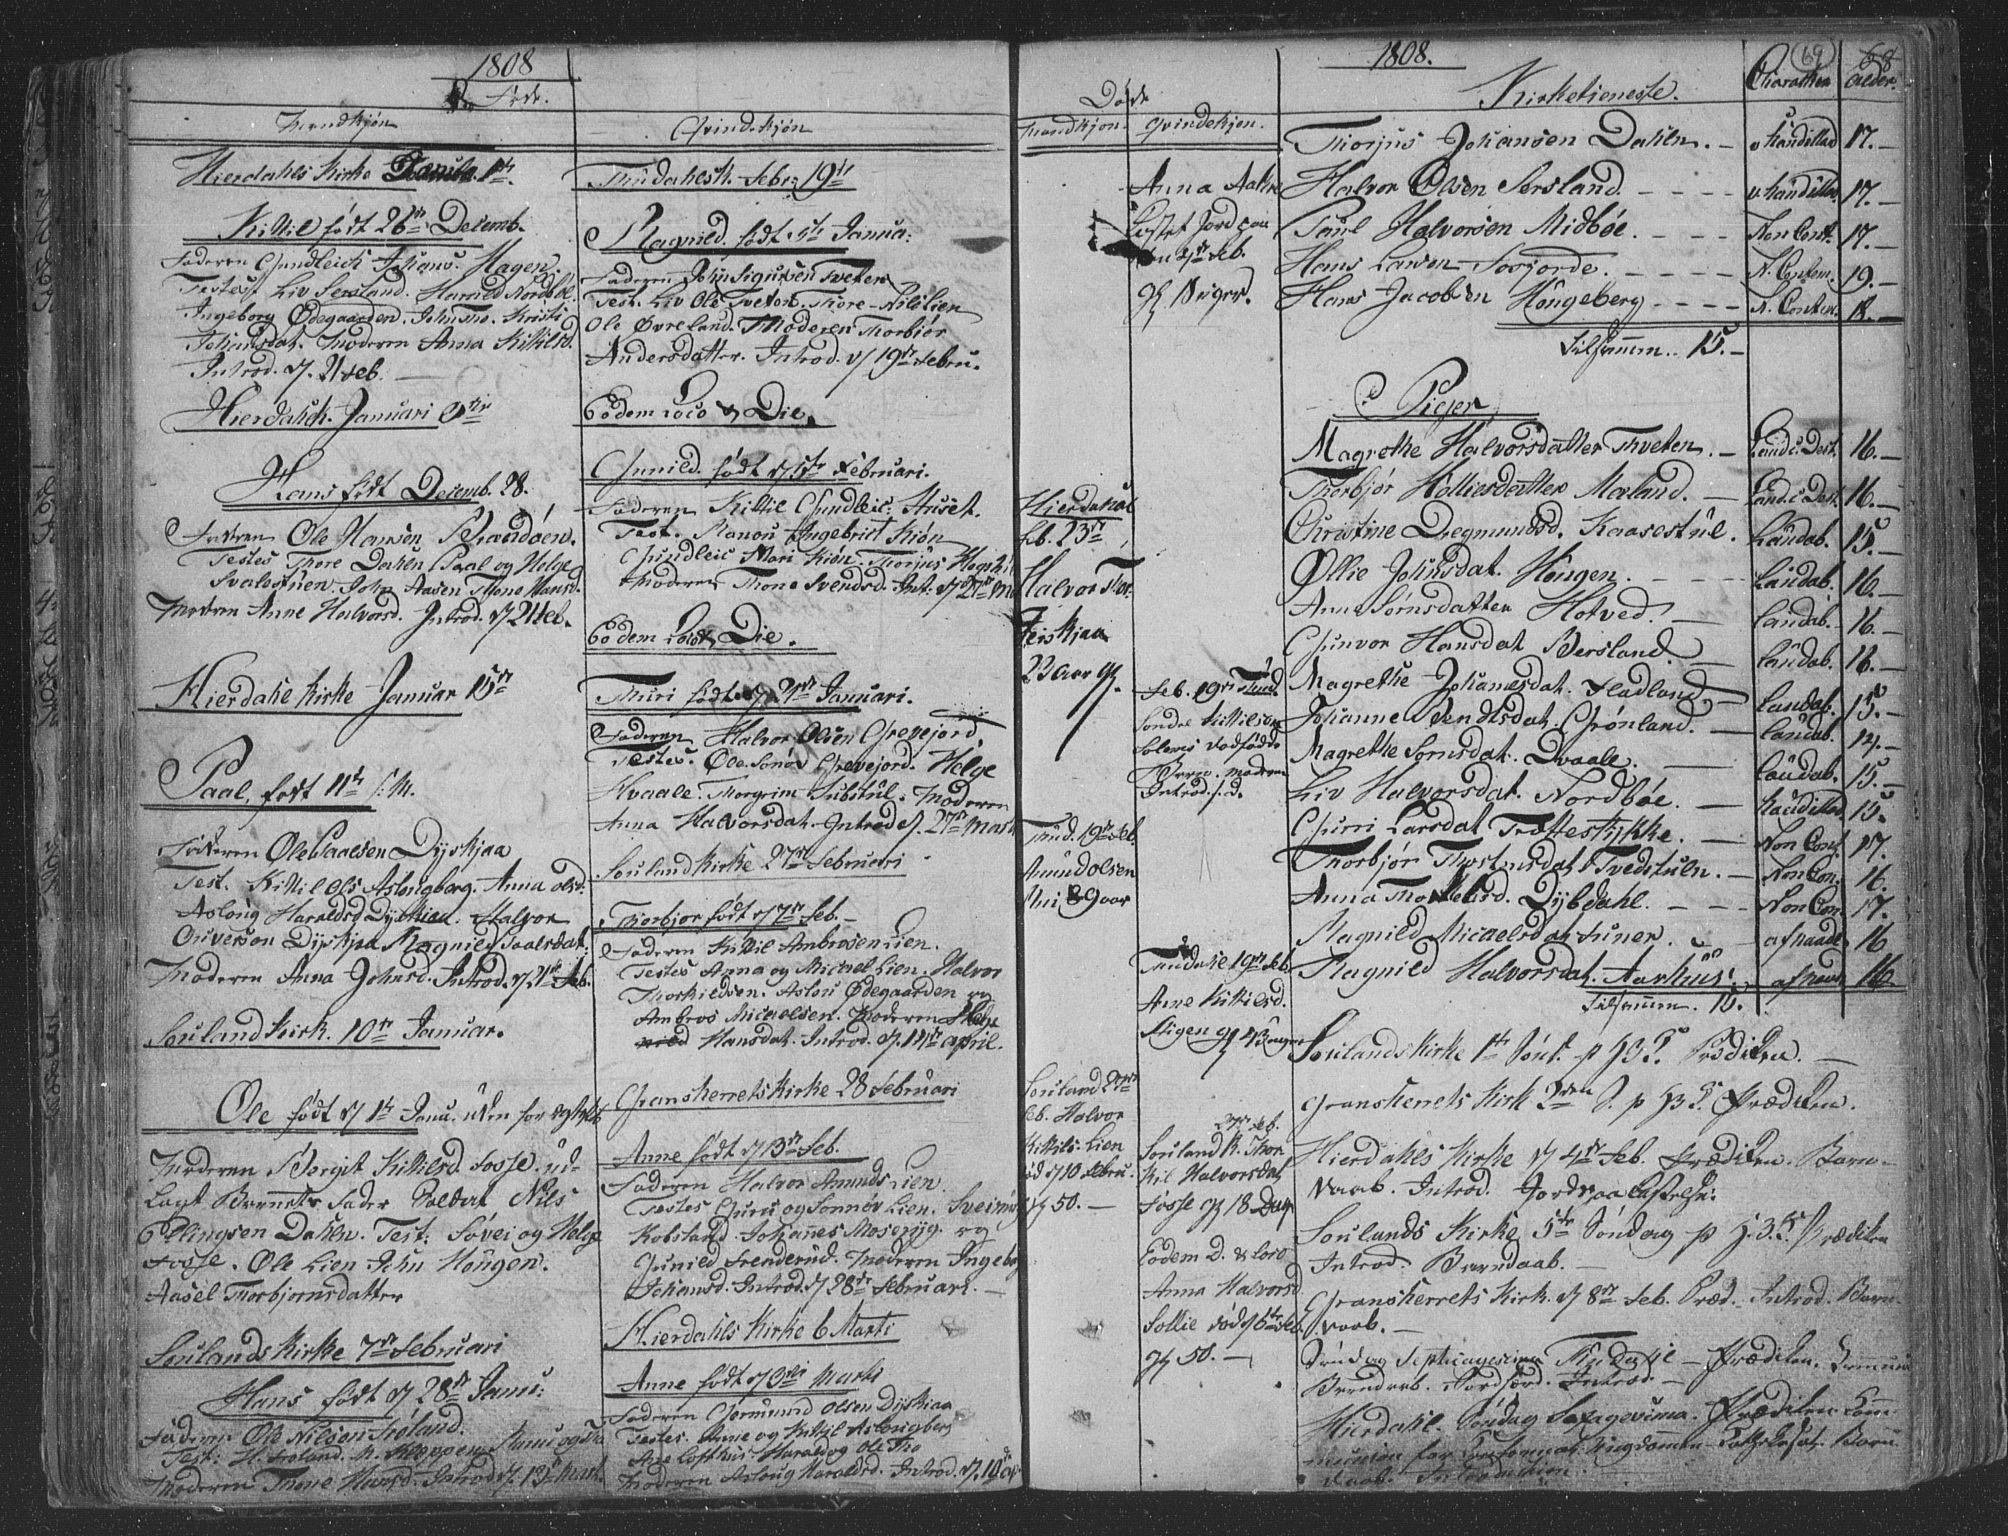 SAKO, Hjartdal kirkebøker, F/Fa/L0006: Ministerialbok nr. I 6, 1801-1814, s. 69